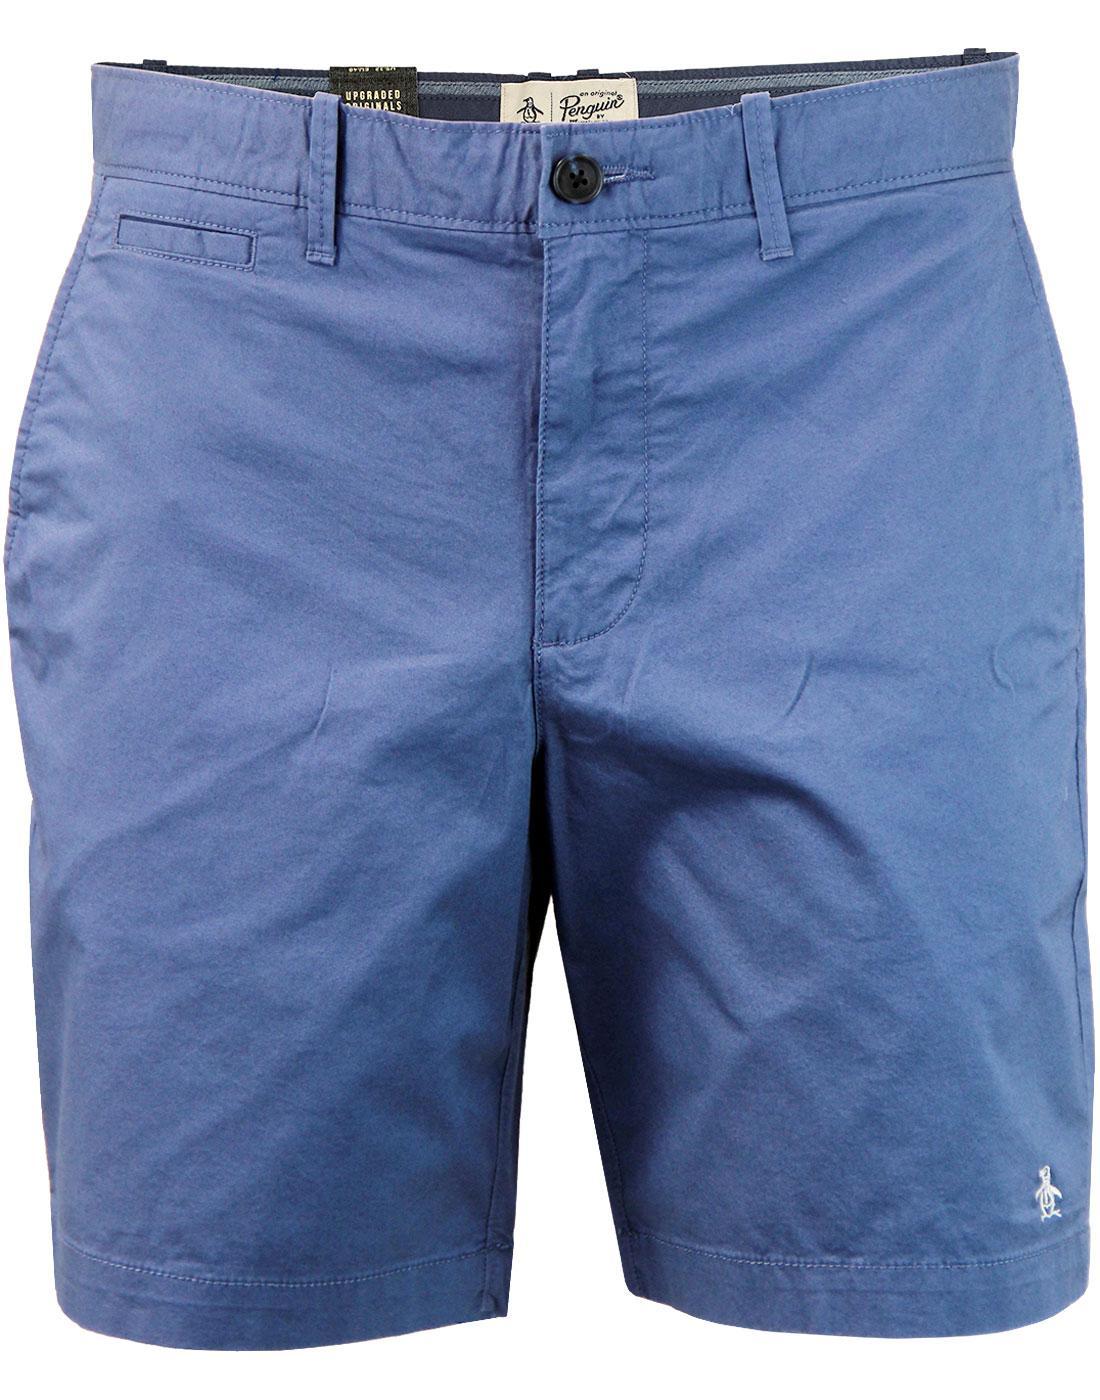 ORIGINAL PENGUIN P55 Retro Slim Chino Shorts I